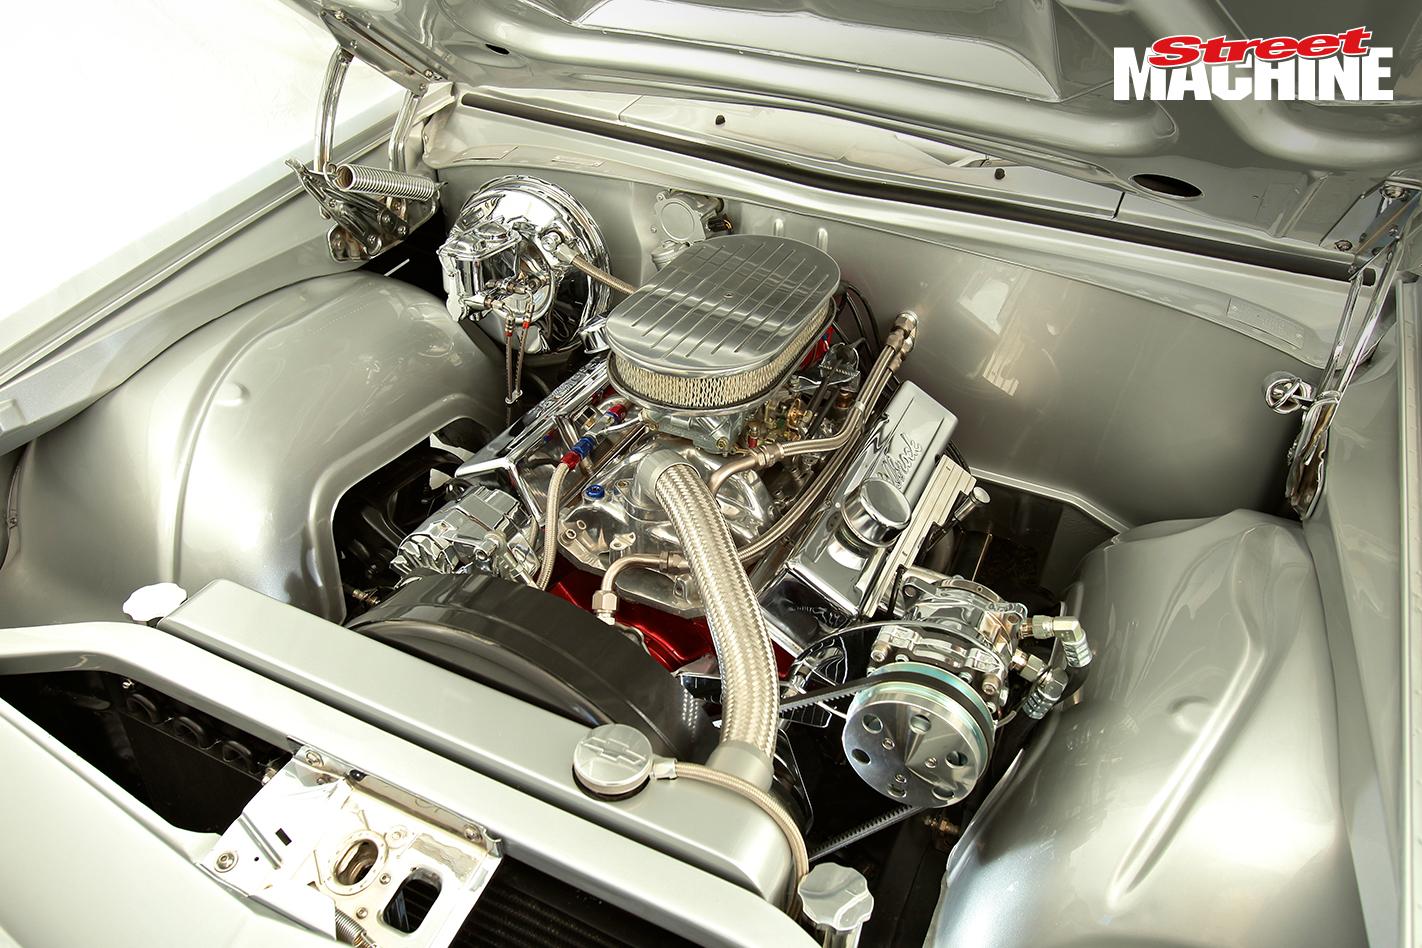 HQ Holden 350 Chev Engine 1